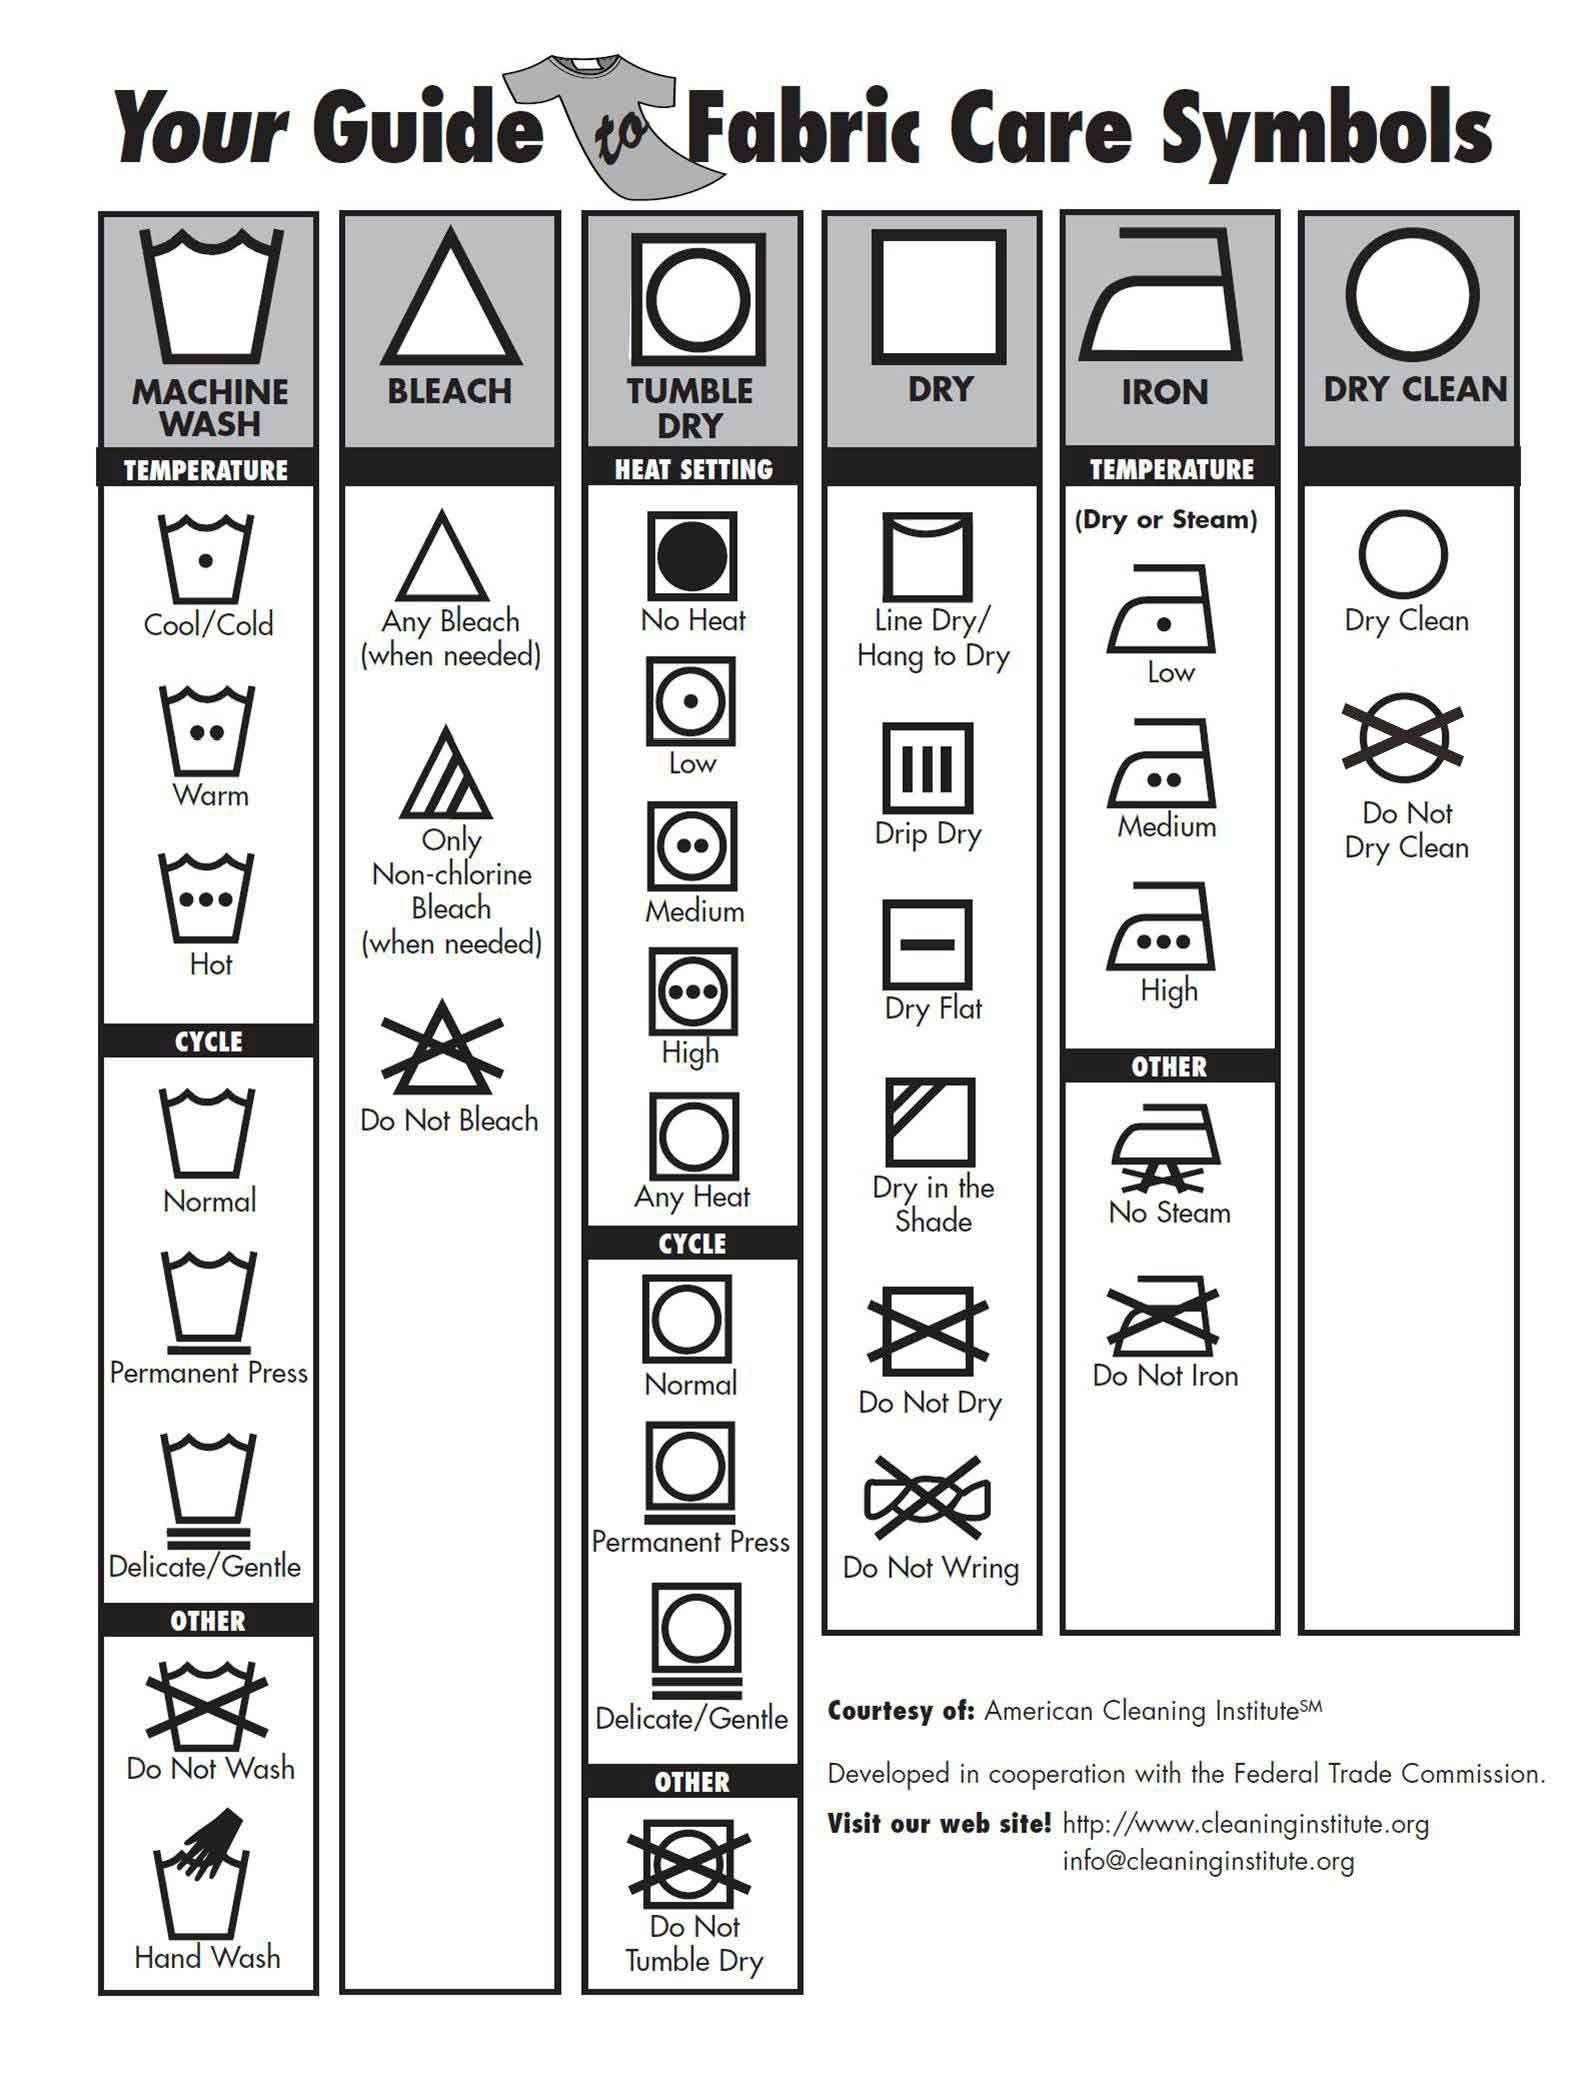 Heloise garmet care symbol guide fabric care symbols